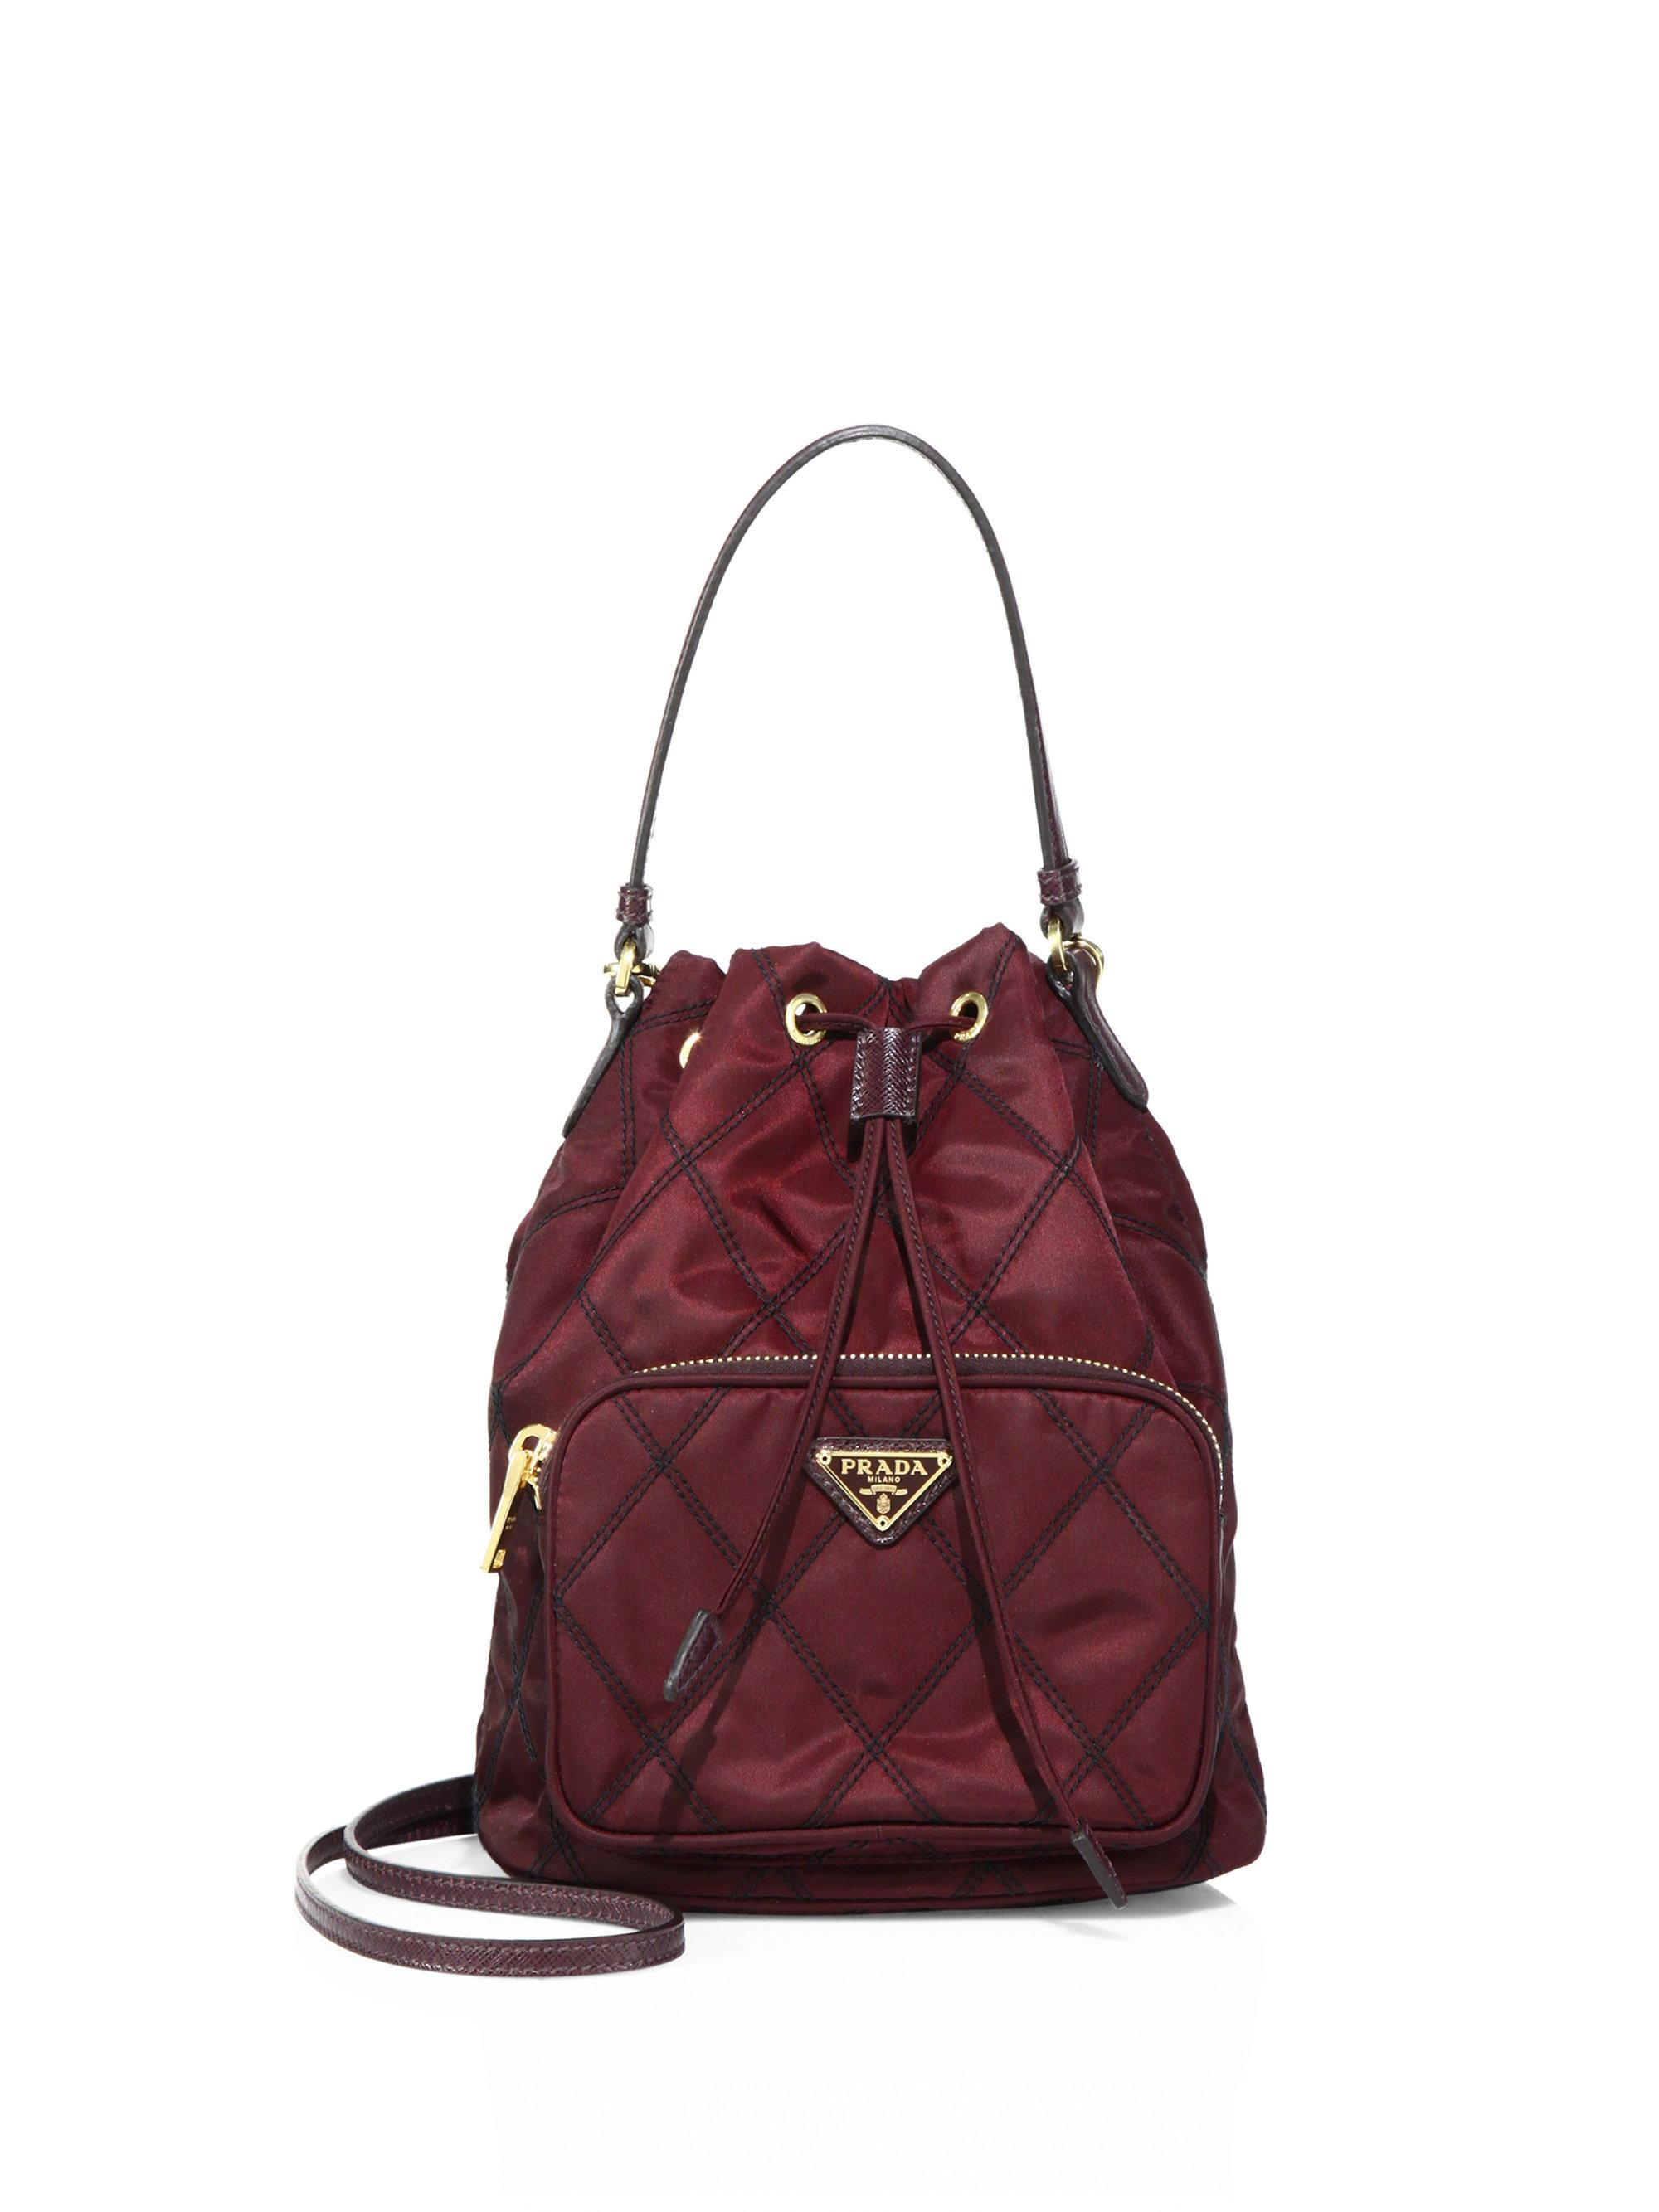 czech prada black nylon leather shoulder bag lyst. view fullscreen a0feb  07f63  italy lyst prada tessuto impunturato quilted nylon bucket bag 64ee4  78e22 18c7de22f0d4d